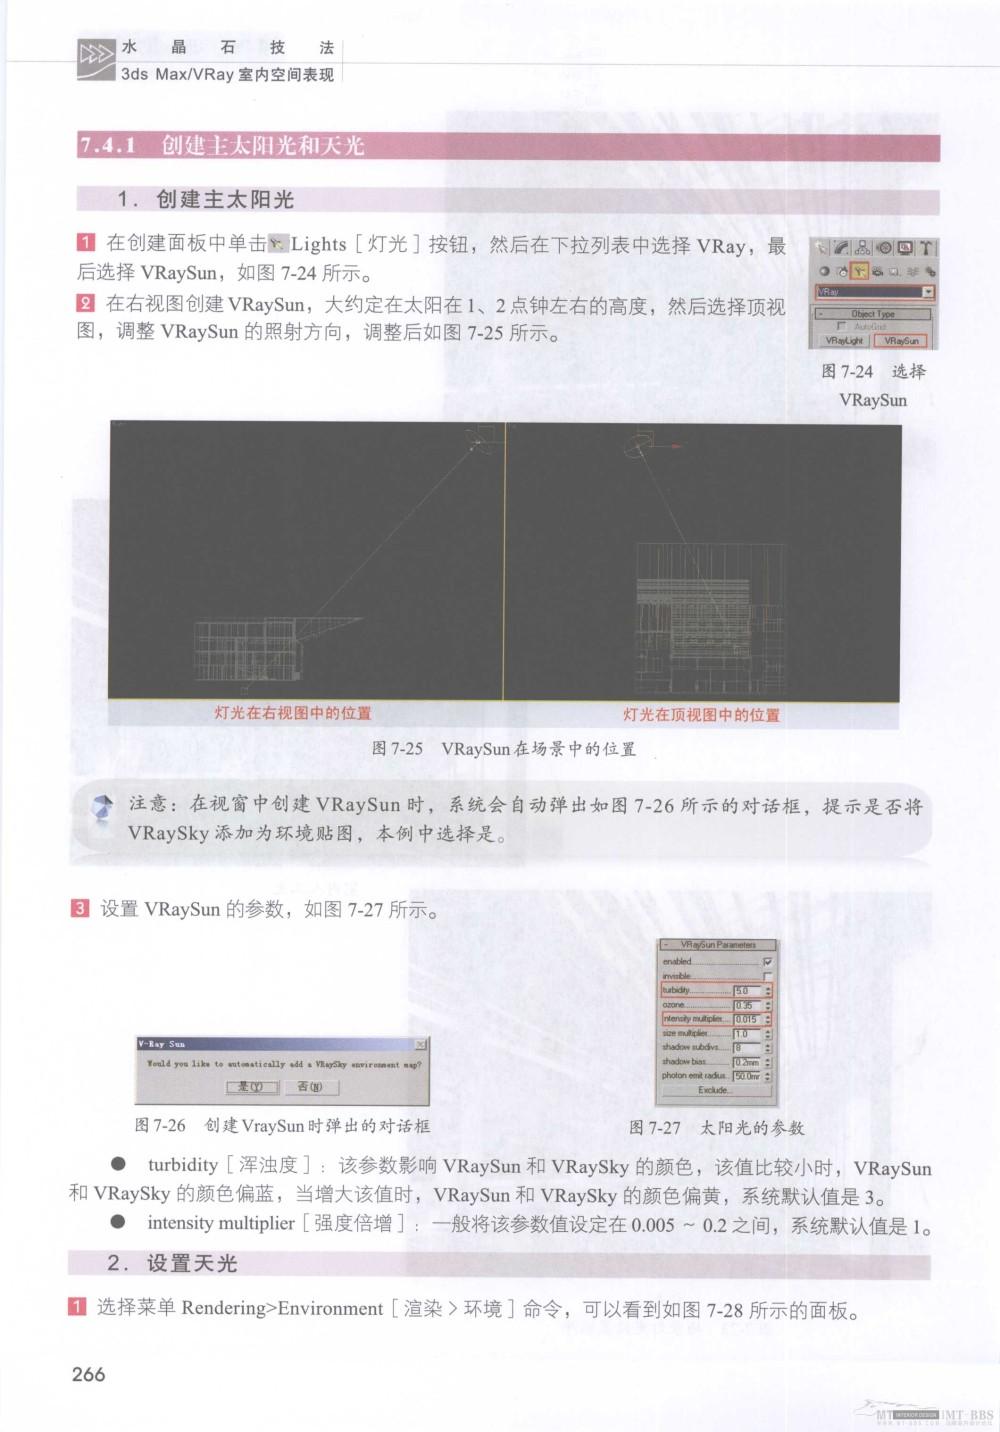 水晶石技法-3ds_Max&VRay室内空间表现_水晶石技法-3ds_Max&VRay室内空间表现_页面_272.jpg